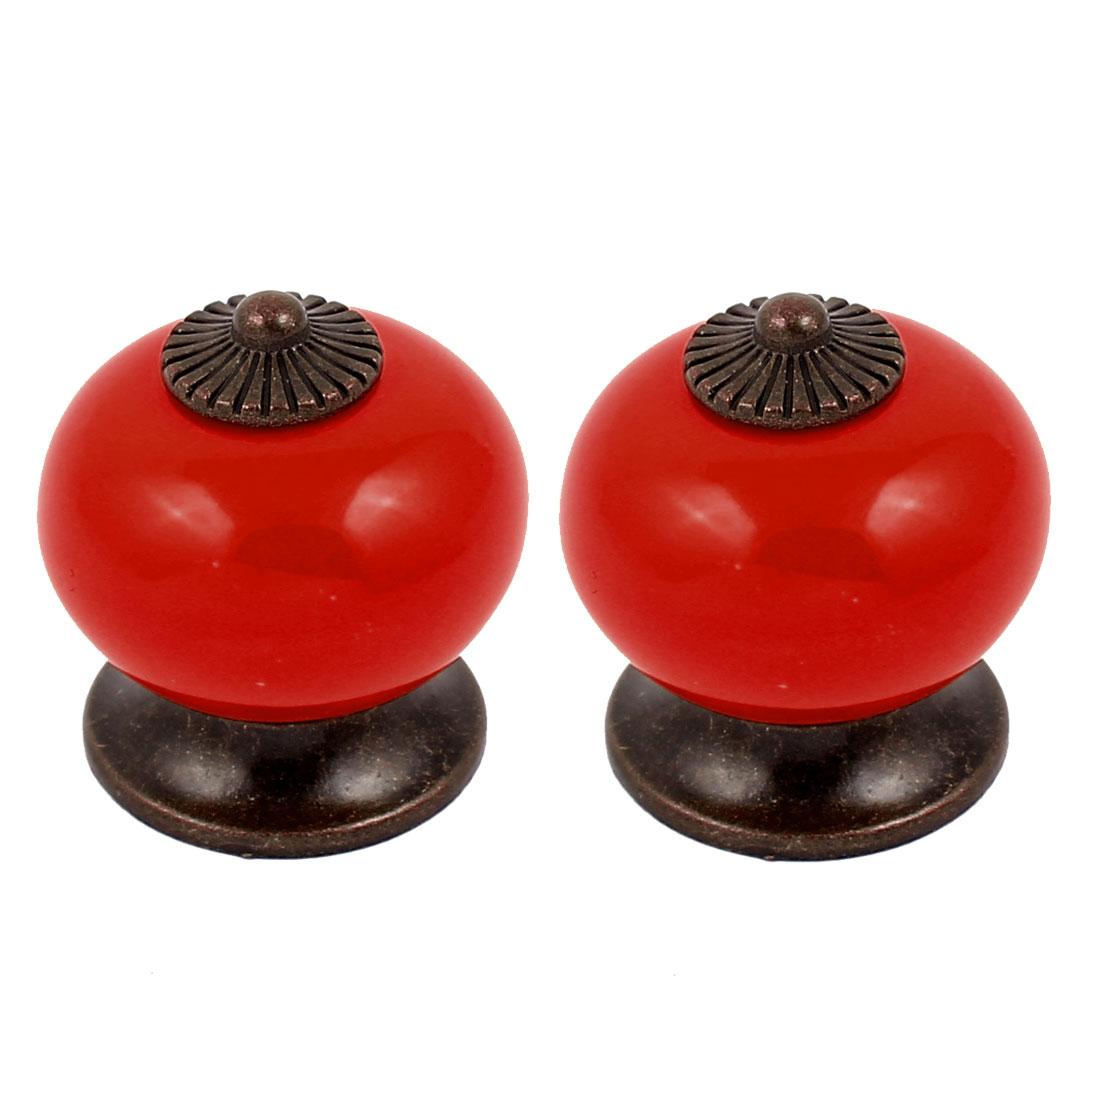 Cabinet Wardrobe Drawer Door Pull Round Ceramic Knobs Handle Red 2pcs